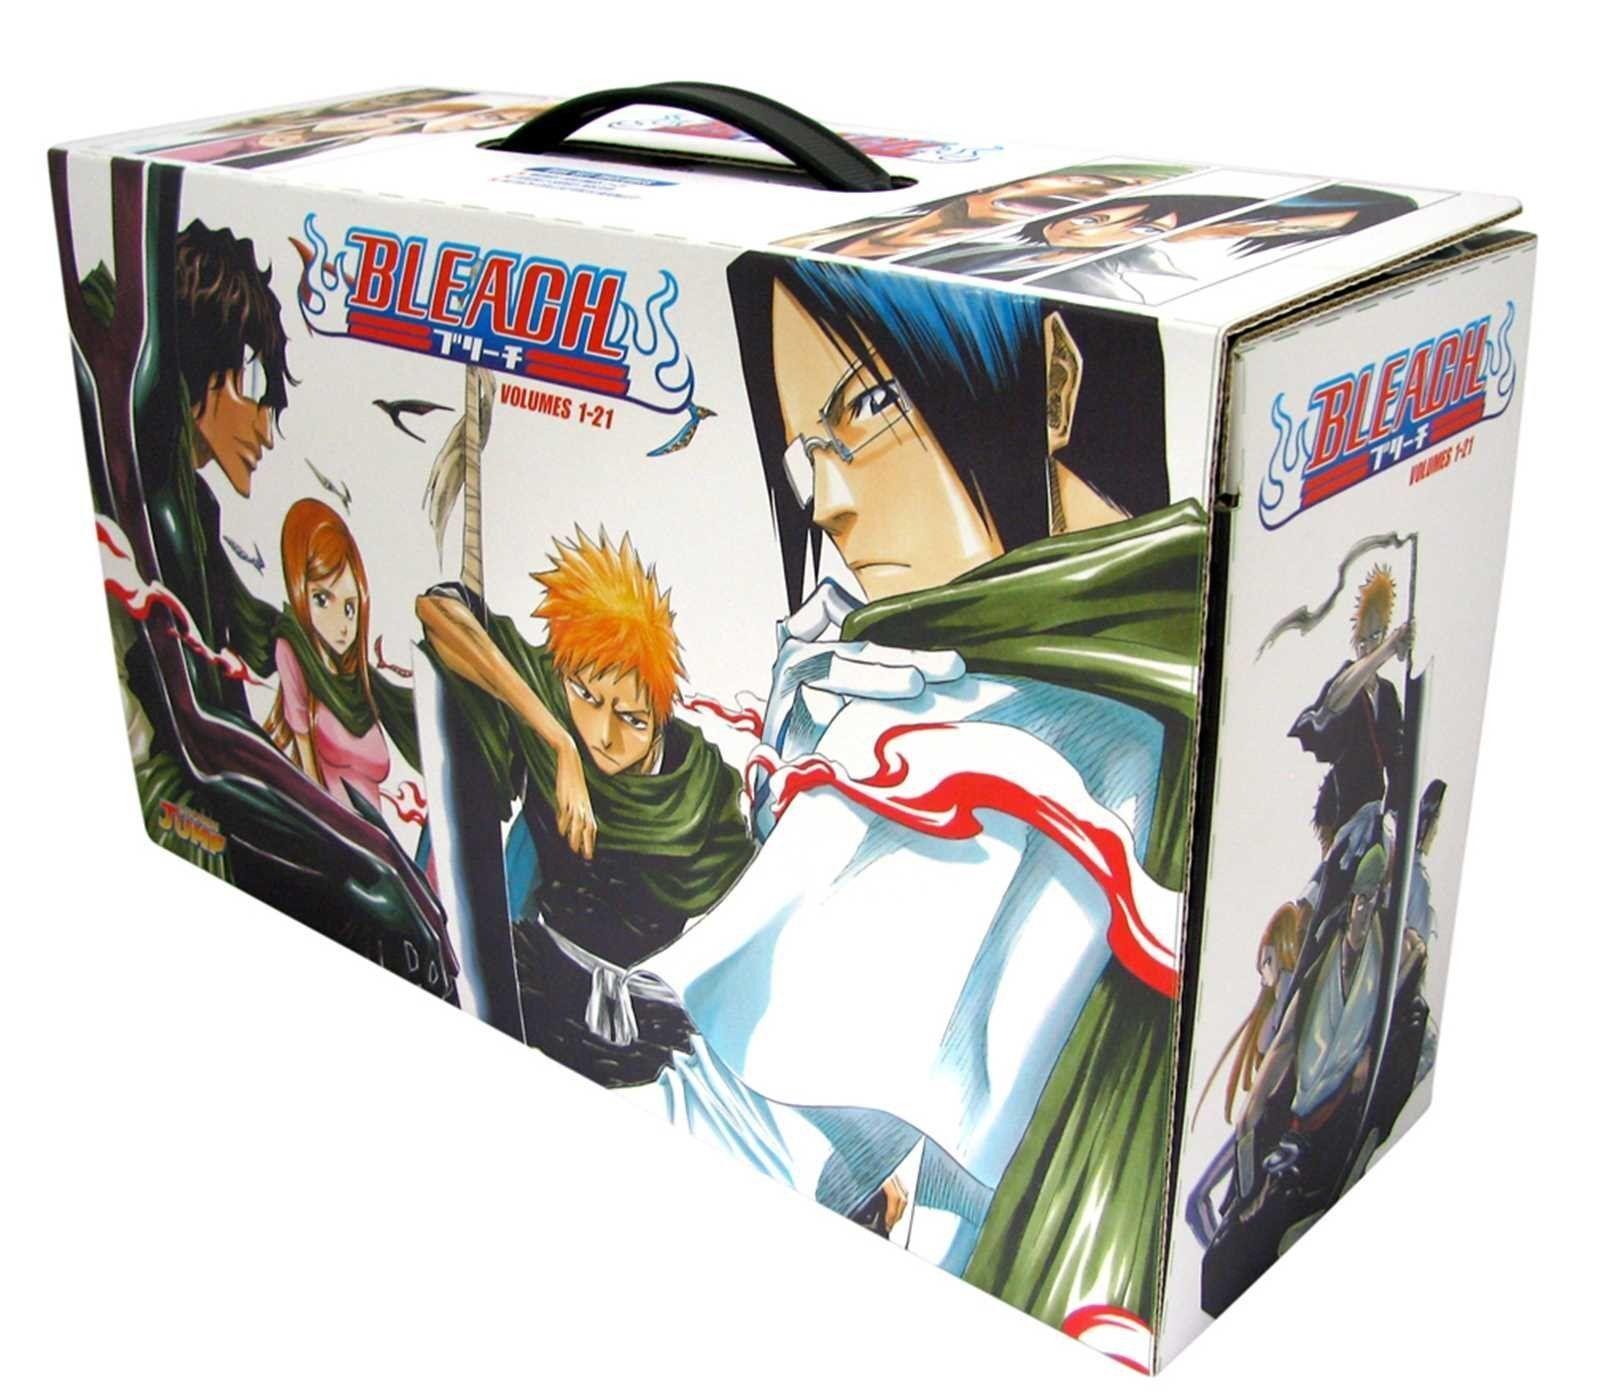 Bleach Box Set 1: Manga Volumes 1-21 Collection Gift Pack ...